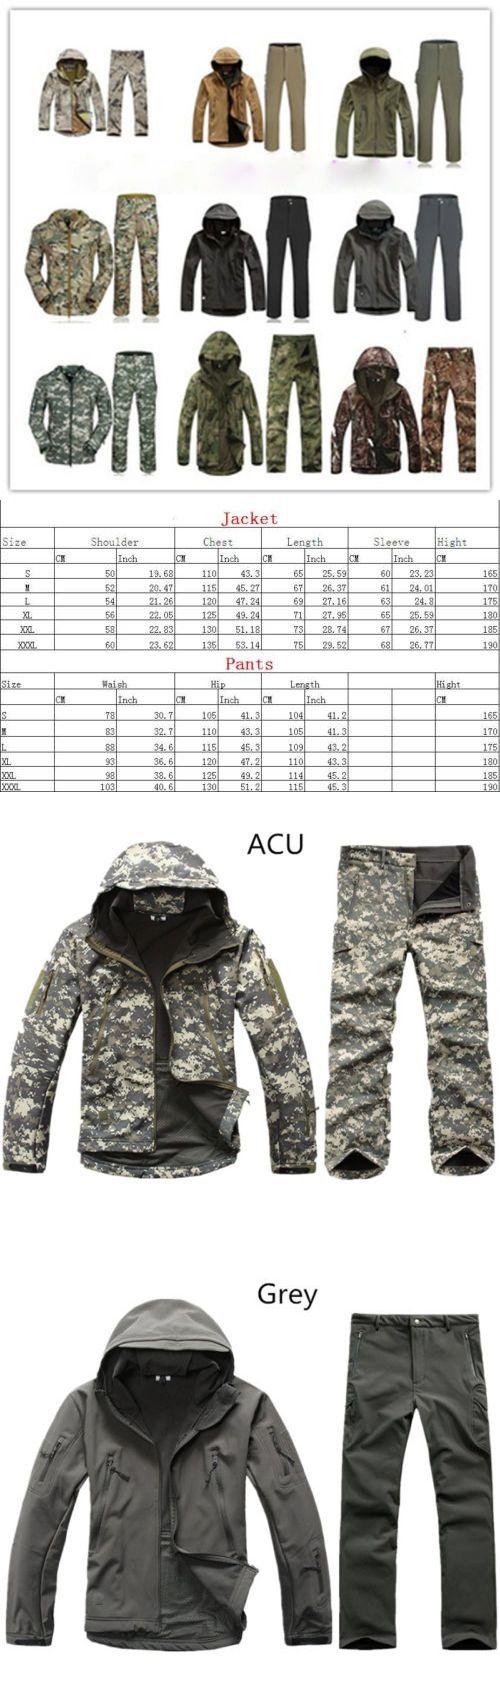 Coats and Jackets 181372: Mens Winter Outdoor Jacket Waterproof Tad Coat Hunting Shark Skin Coat +Pants BUY IT NOW ONLY: $41.84